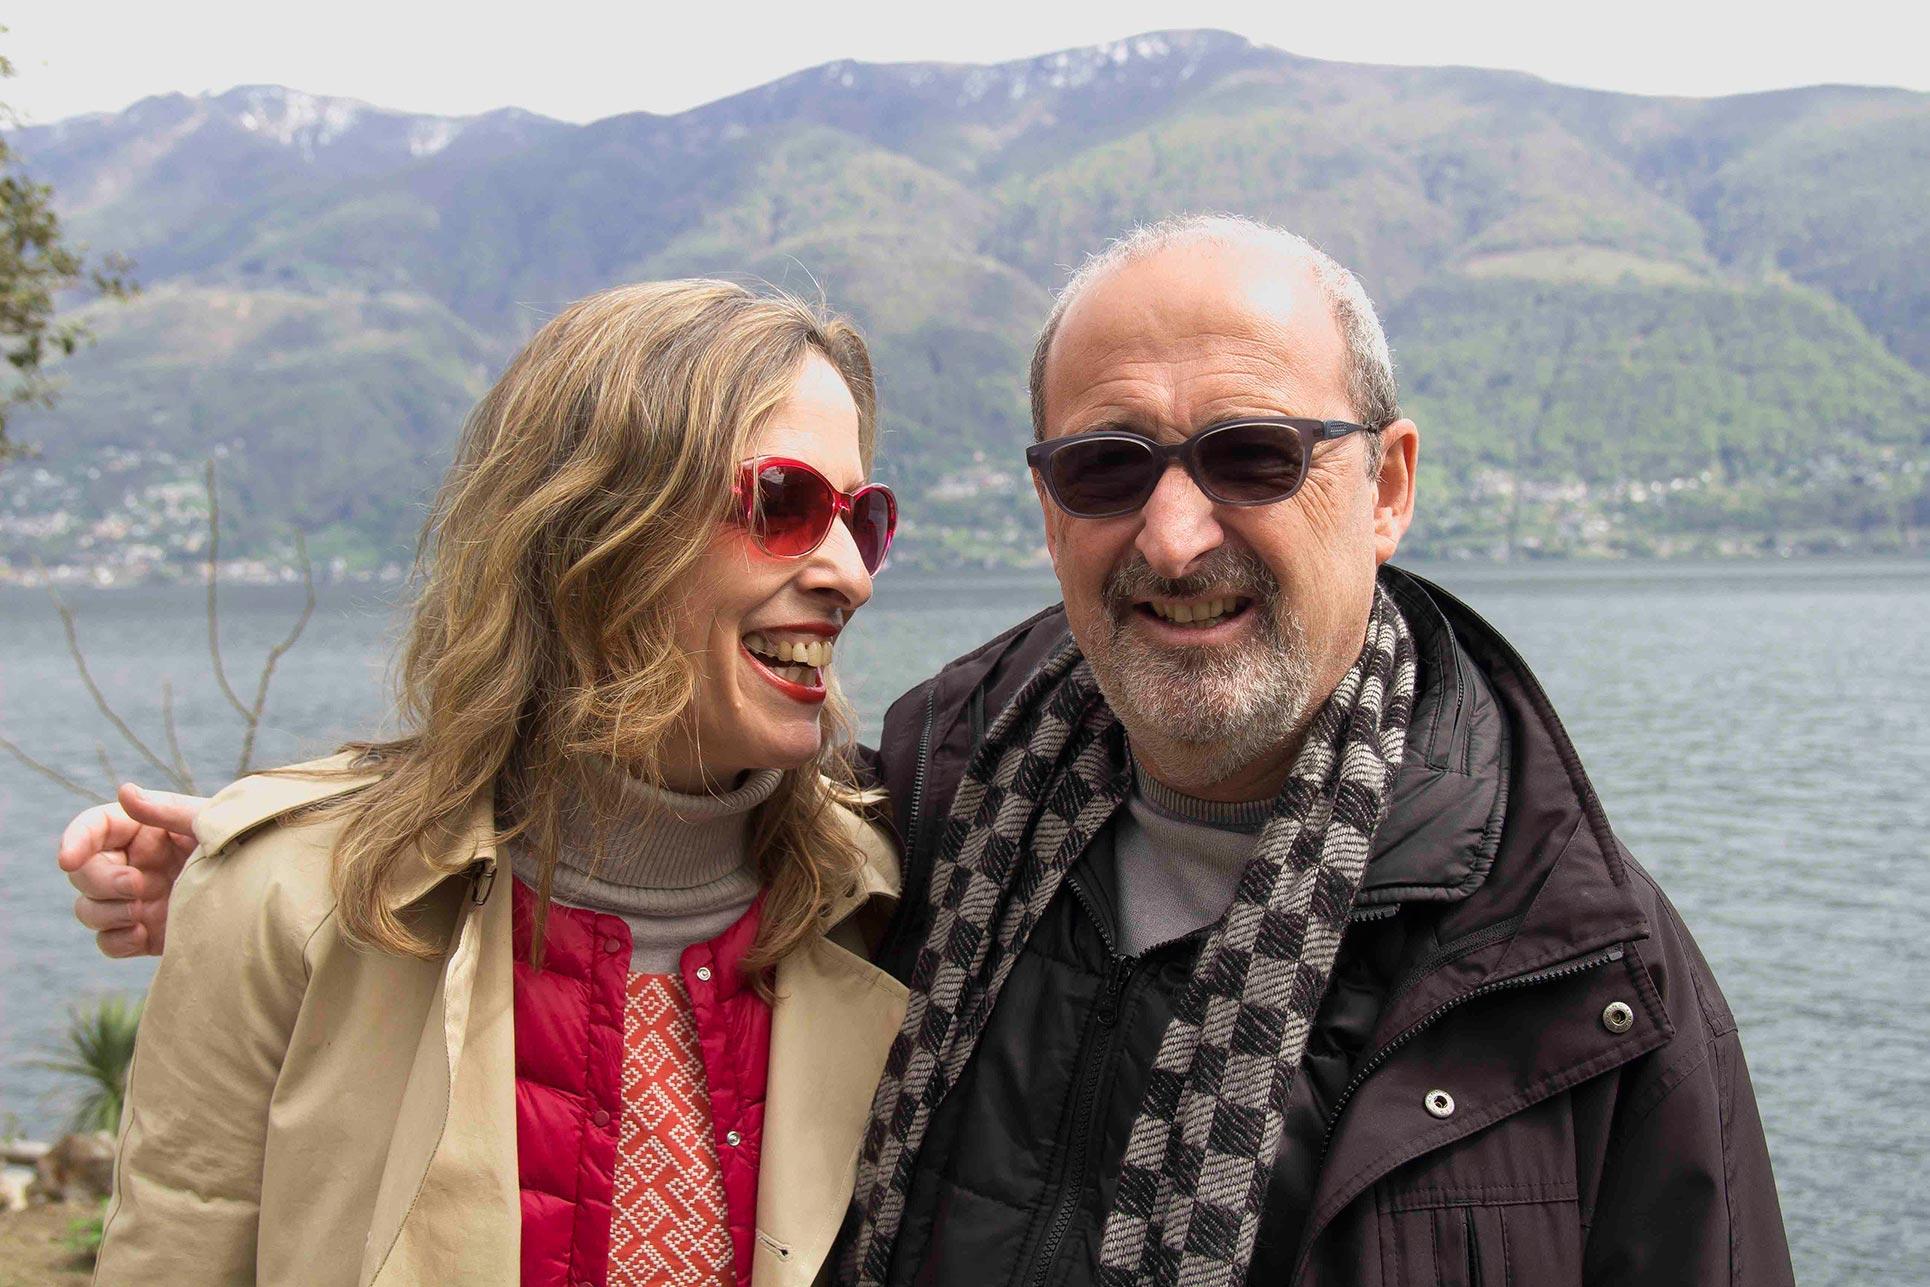 Barbara Fässler and Domenico Lucchini (Photo: Paolo Bergmann)